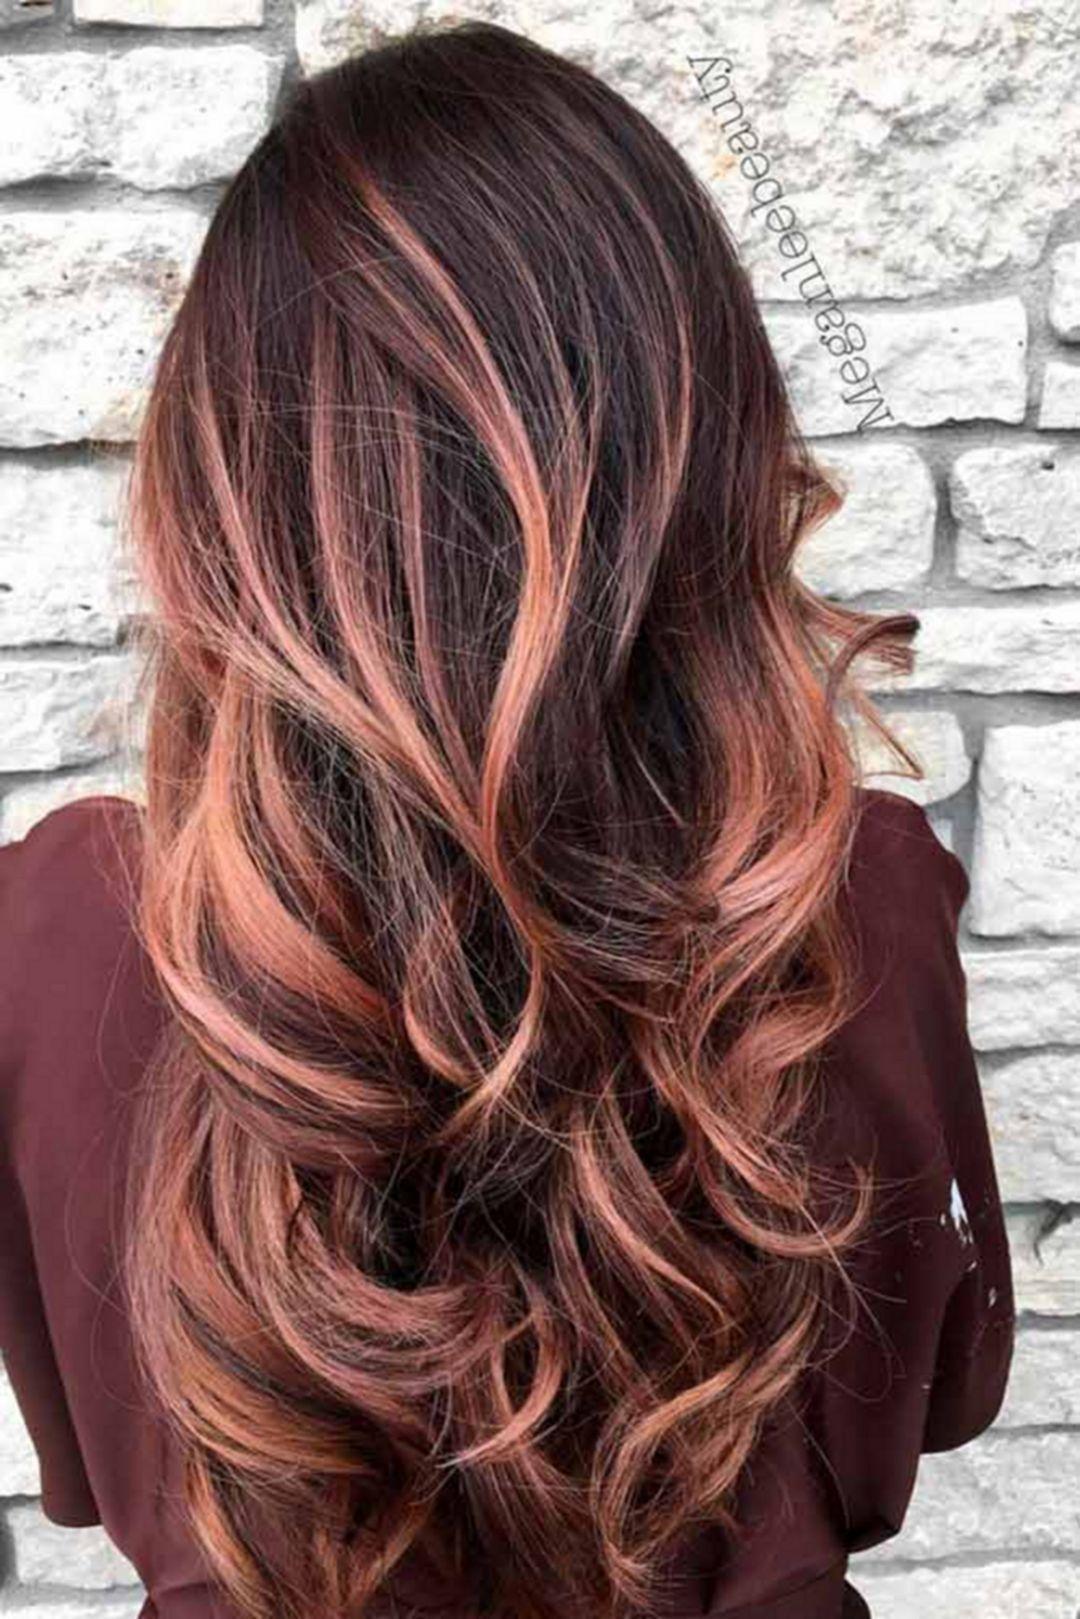 Women best ombre hairstyles 2019